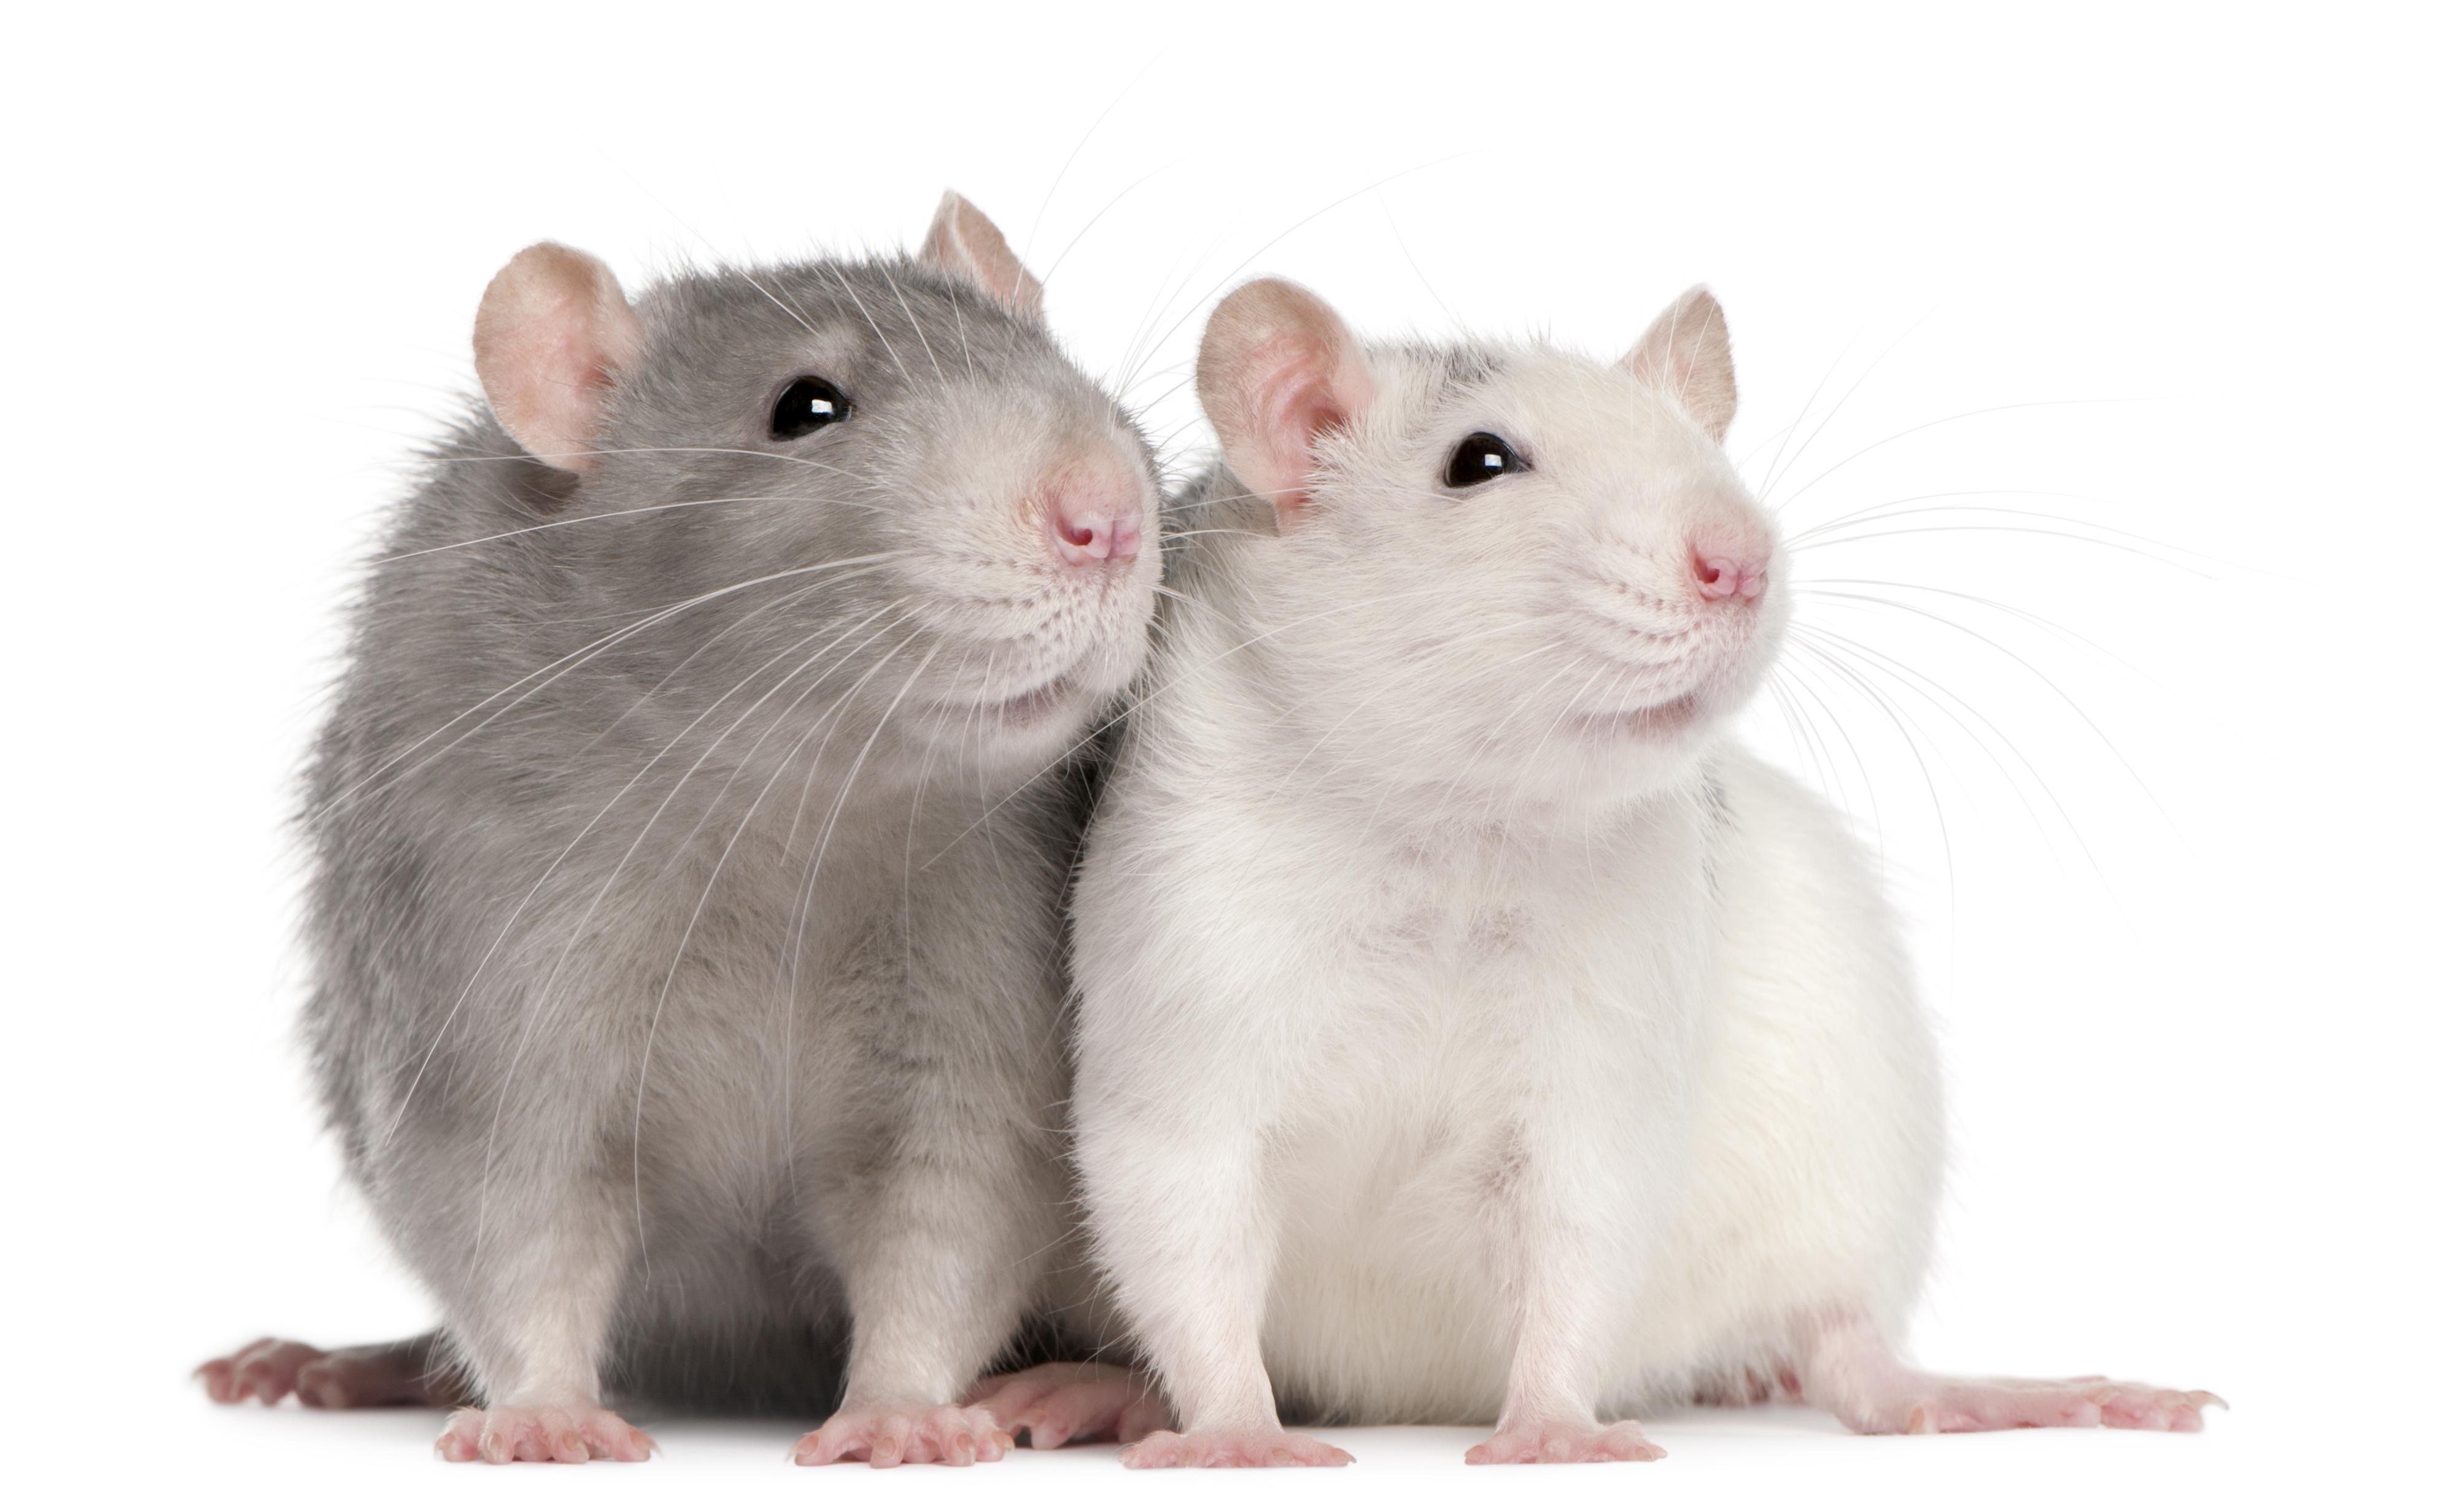 Rats. NYC sterilizing them. - Alltop Viral